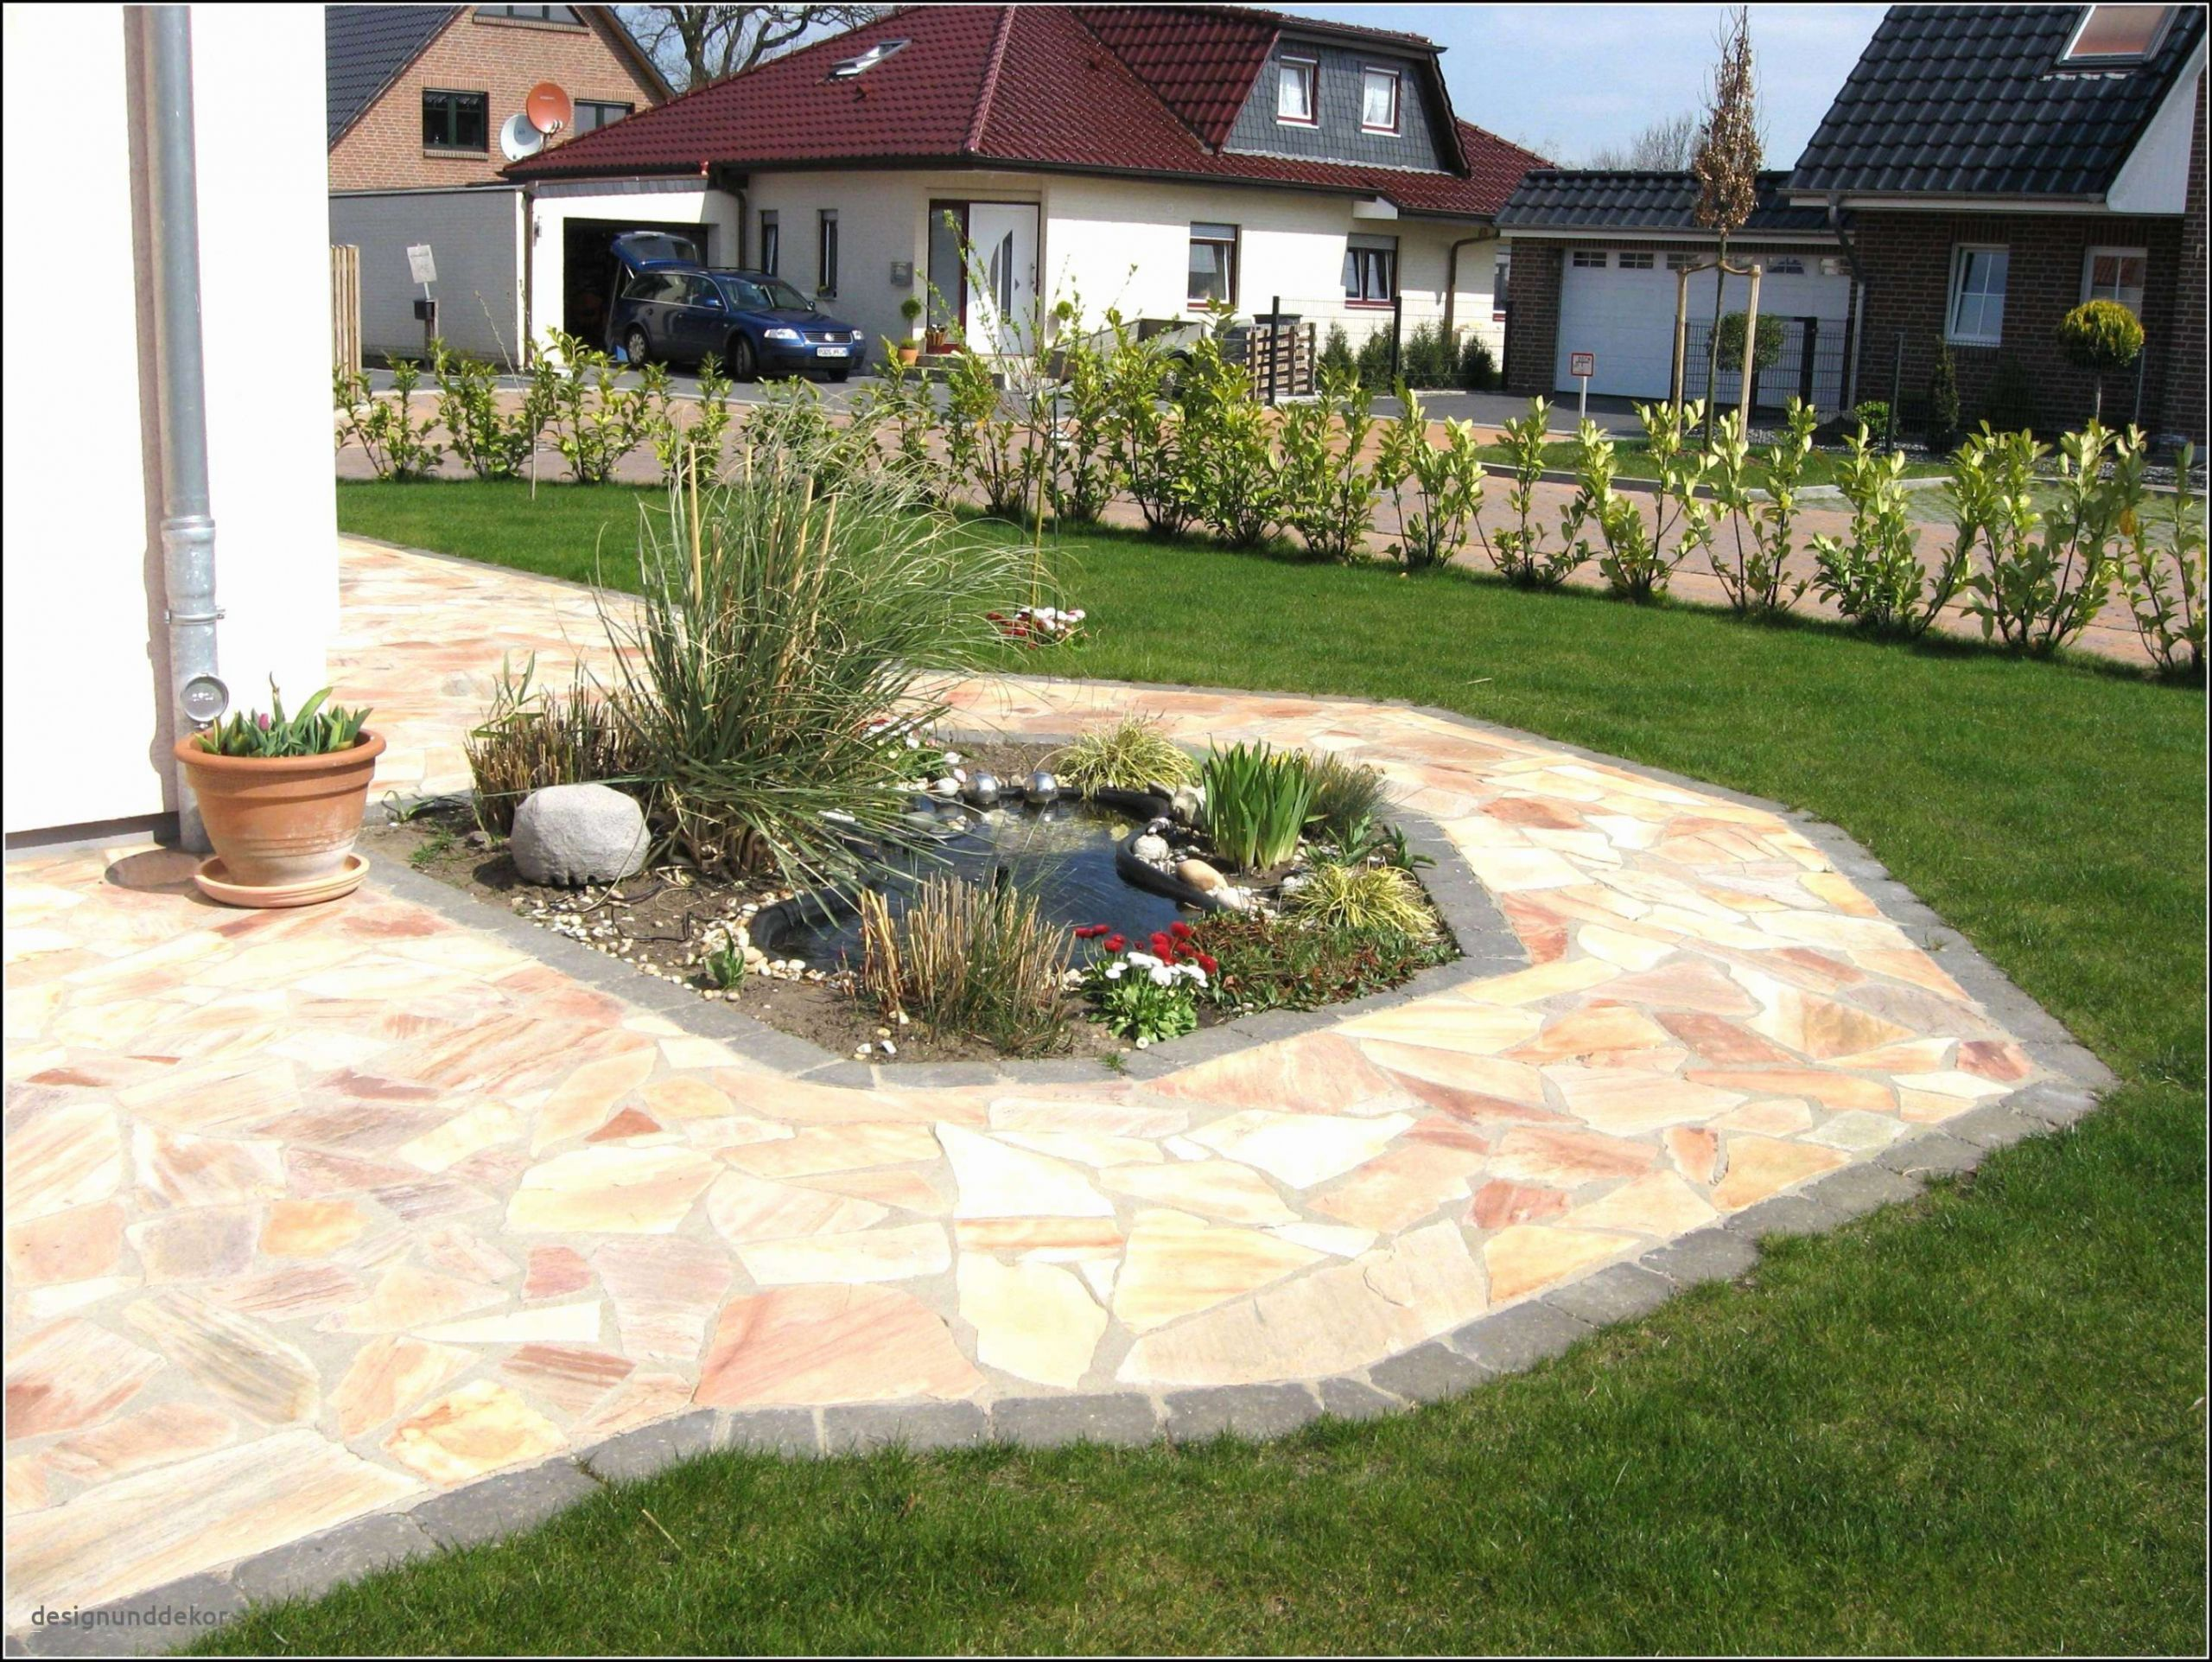 Garten Bepflanzung Planen Neu Hang Gestalten Pflegeleicht — Temobardz Home Blog